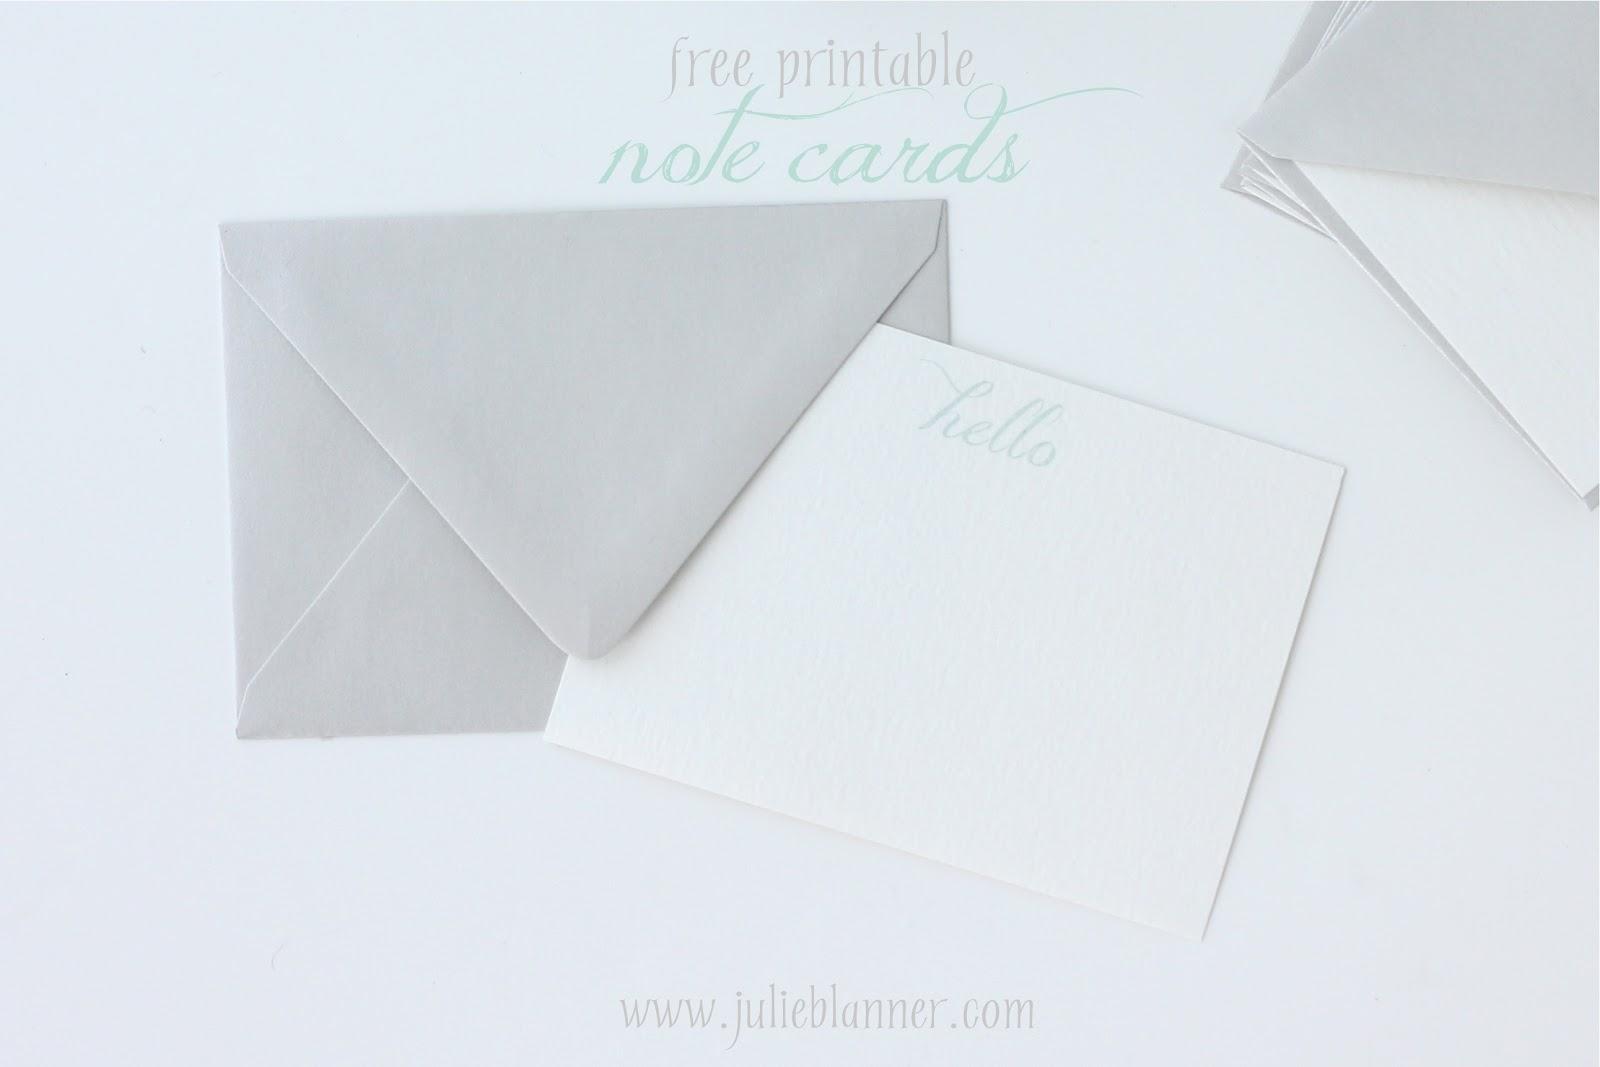 Printable Note Cards Free Printable Notecards Julie Blanner Entertaining Home